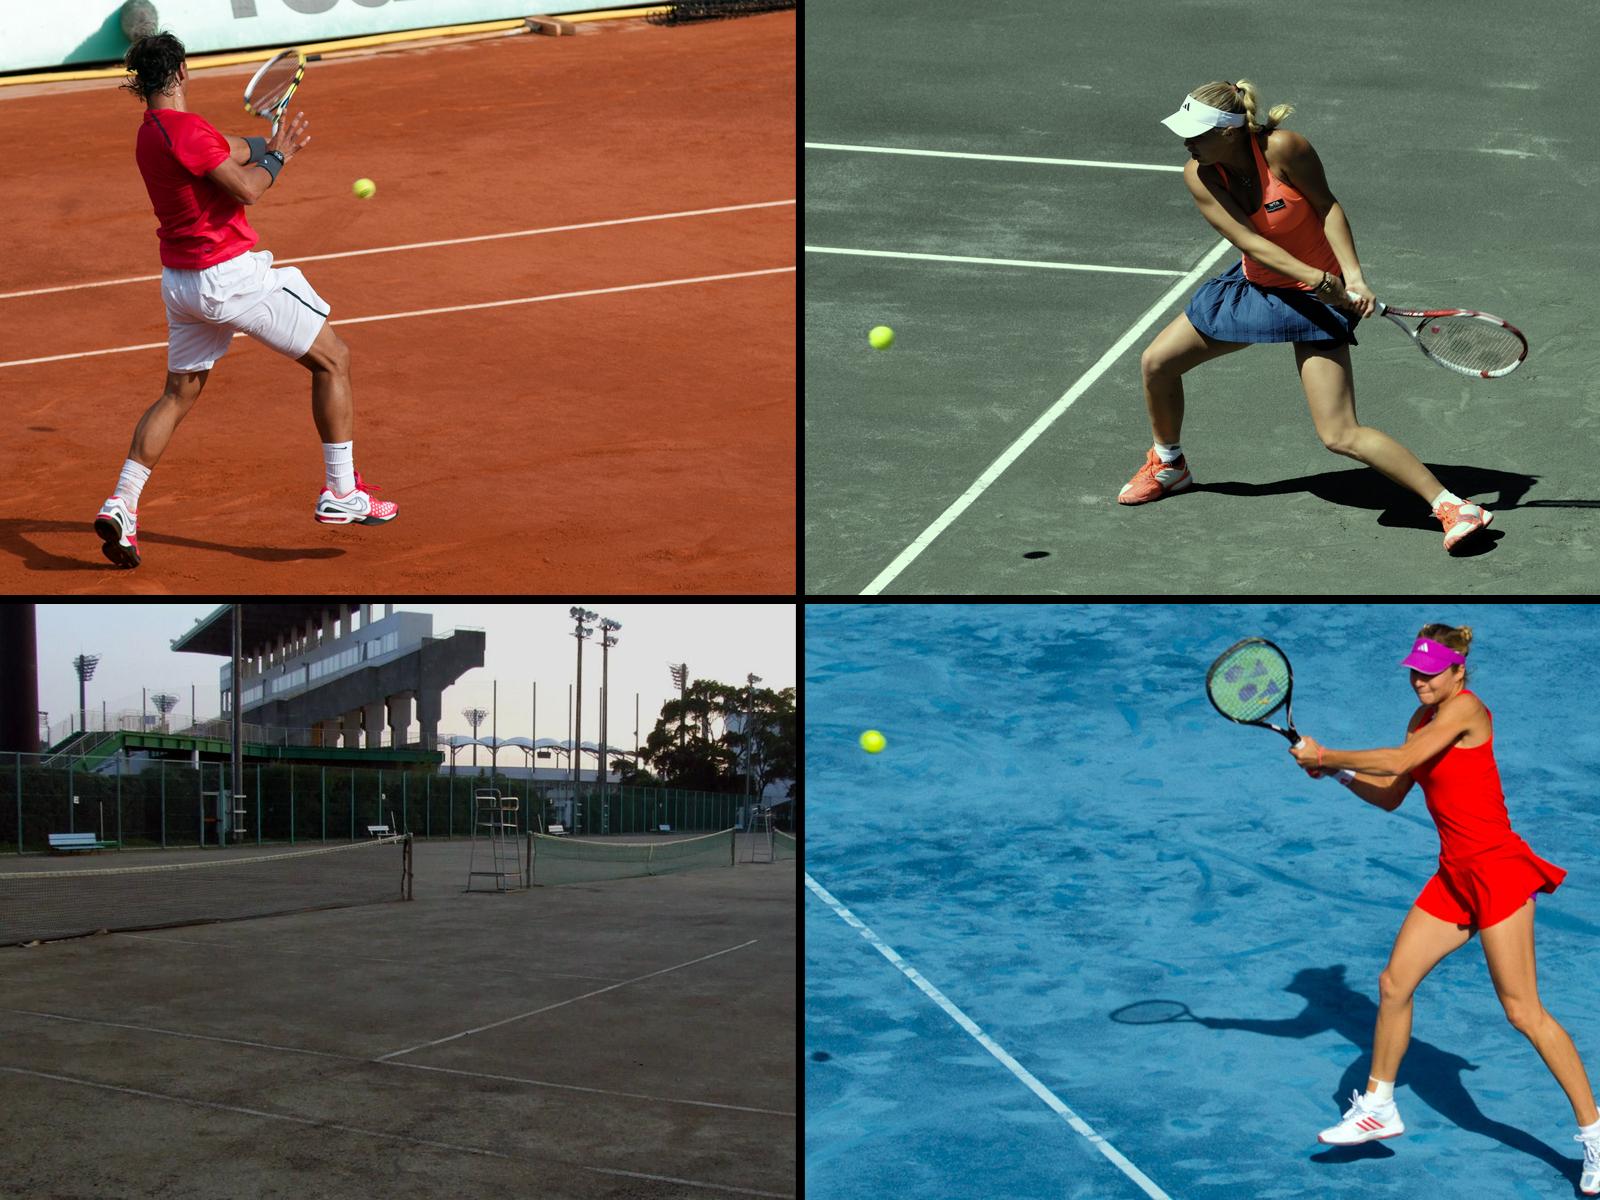 Clay Court Tennis Shoes Australia